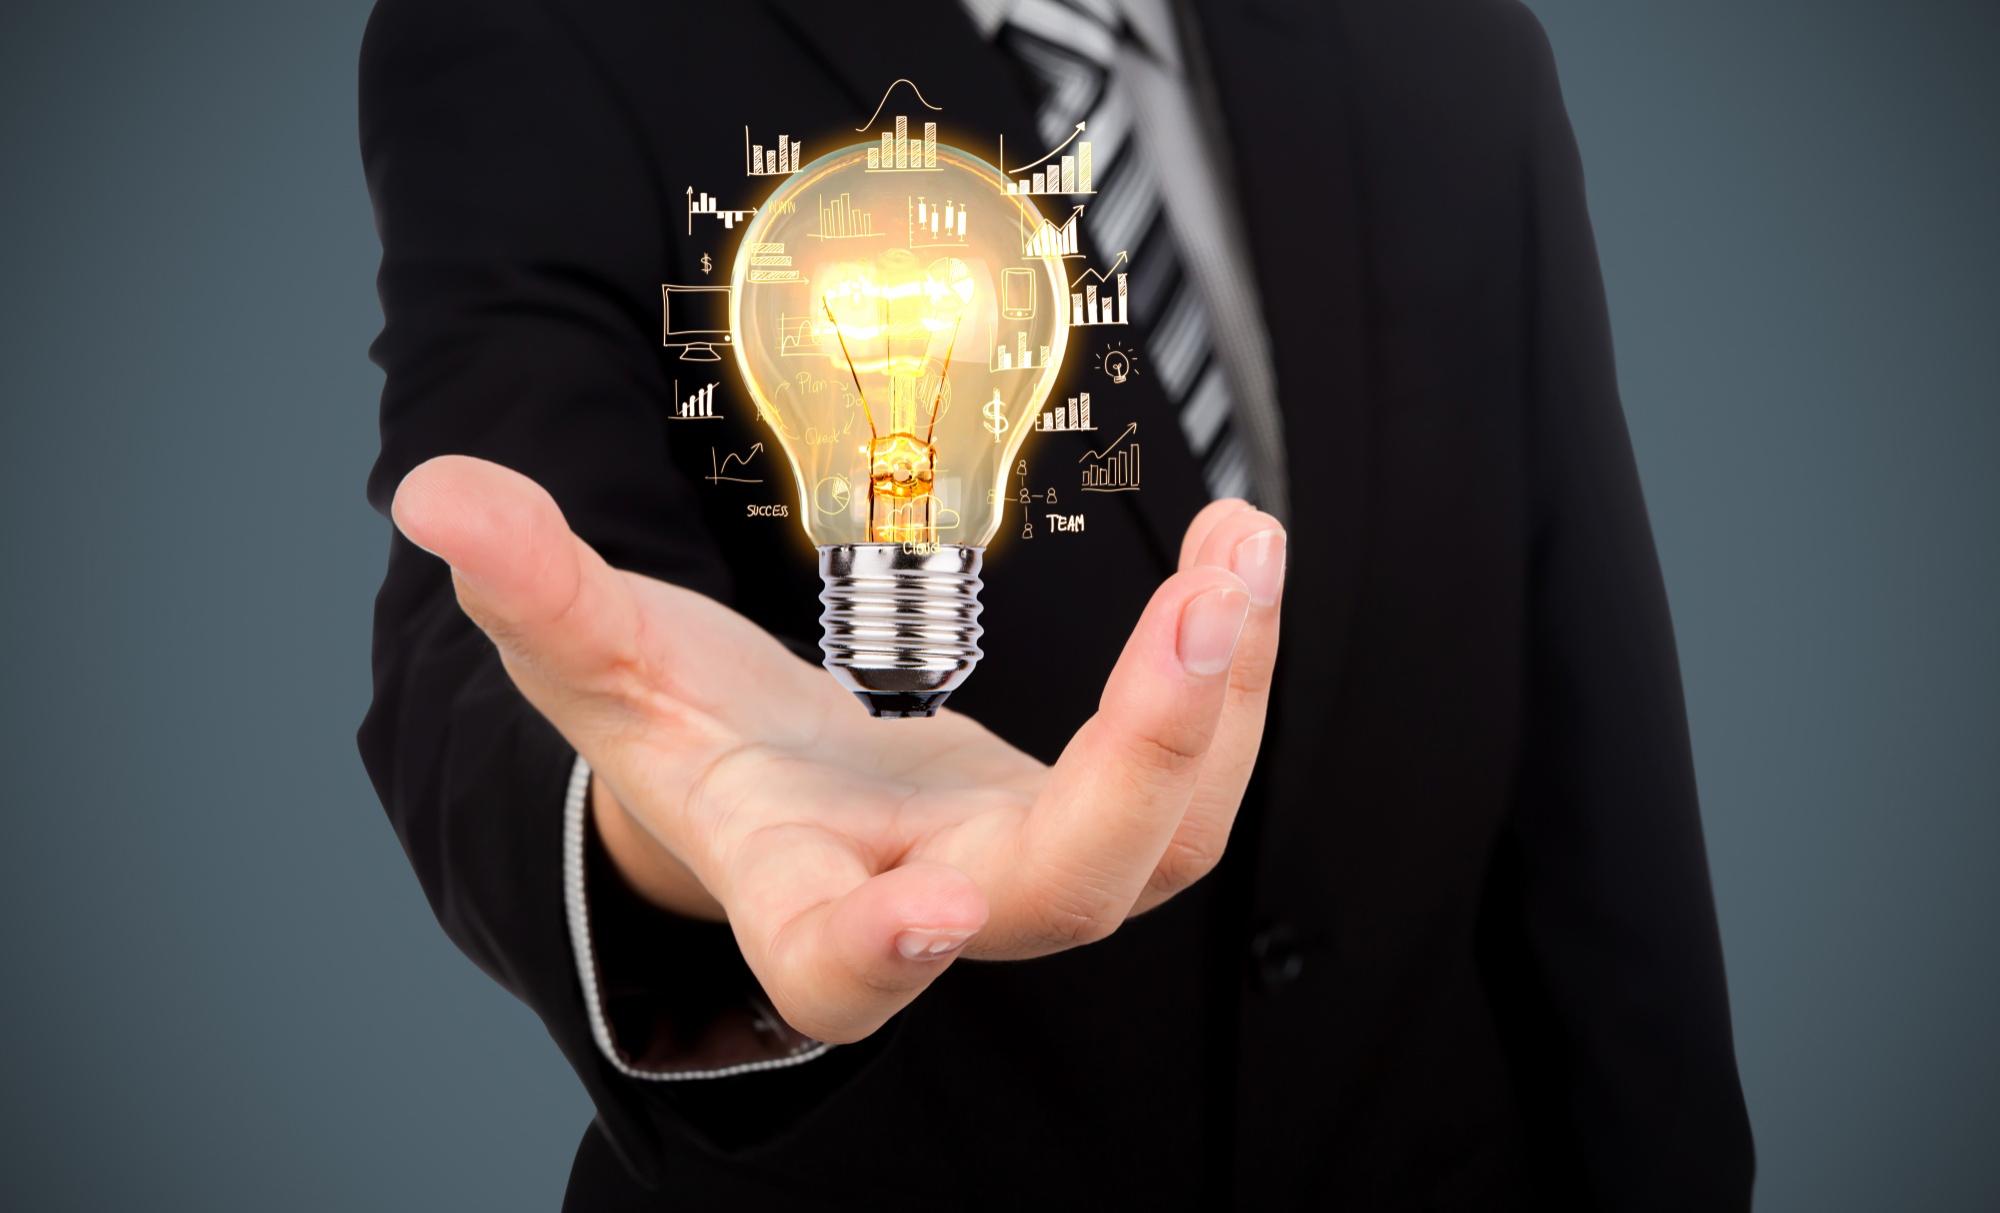 inovacao sustentavel na industria